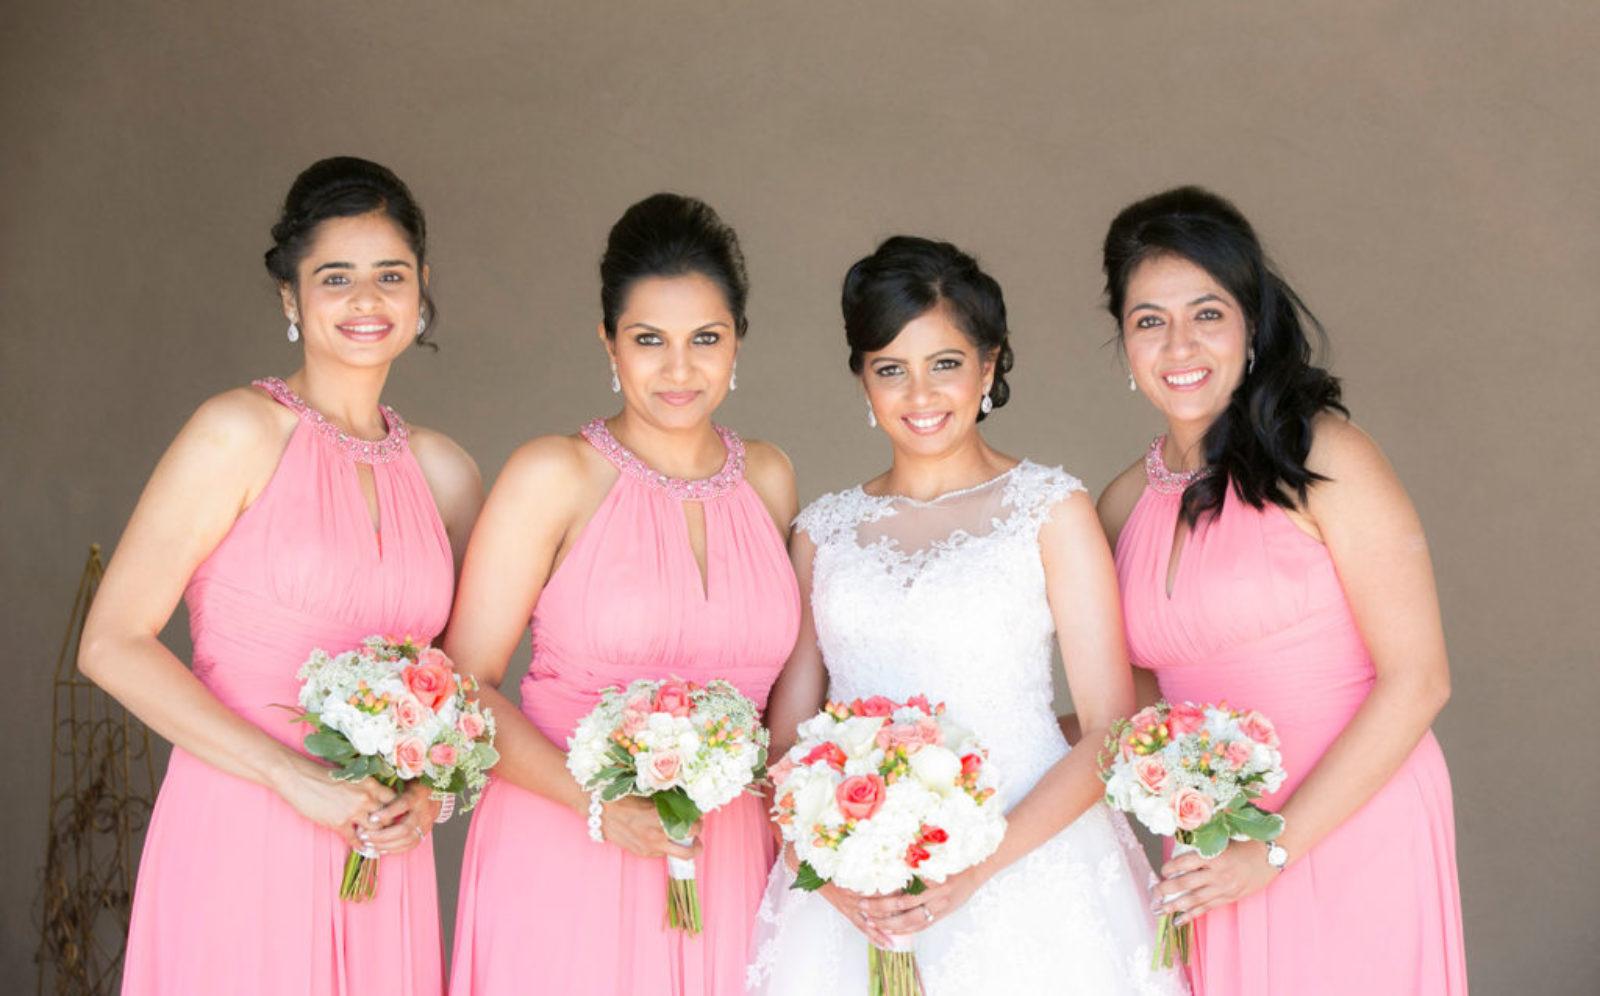 weddingphotographycoloradosprings_29-1024x638